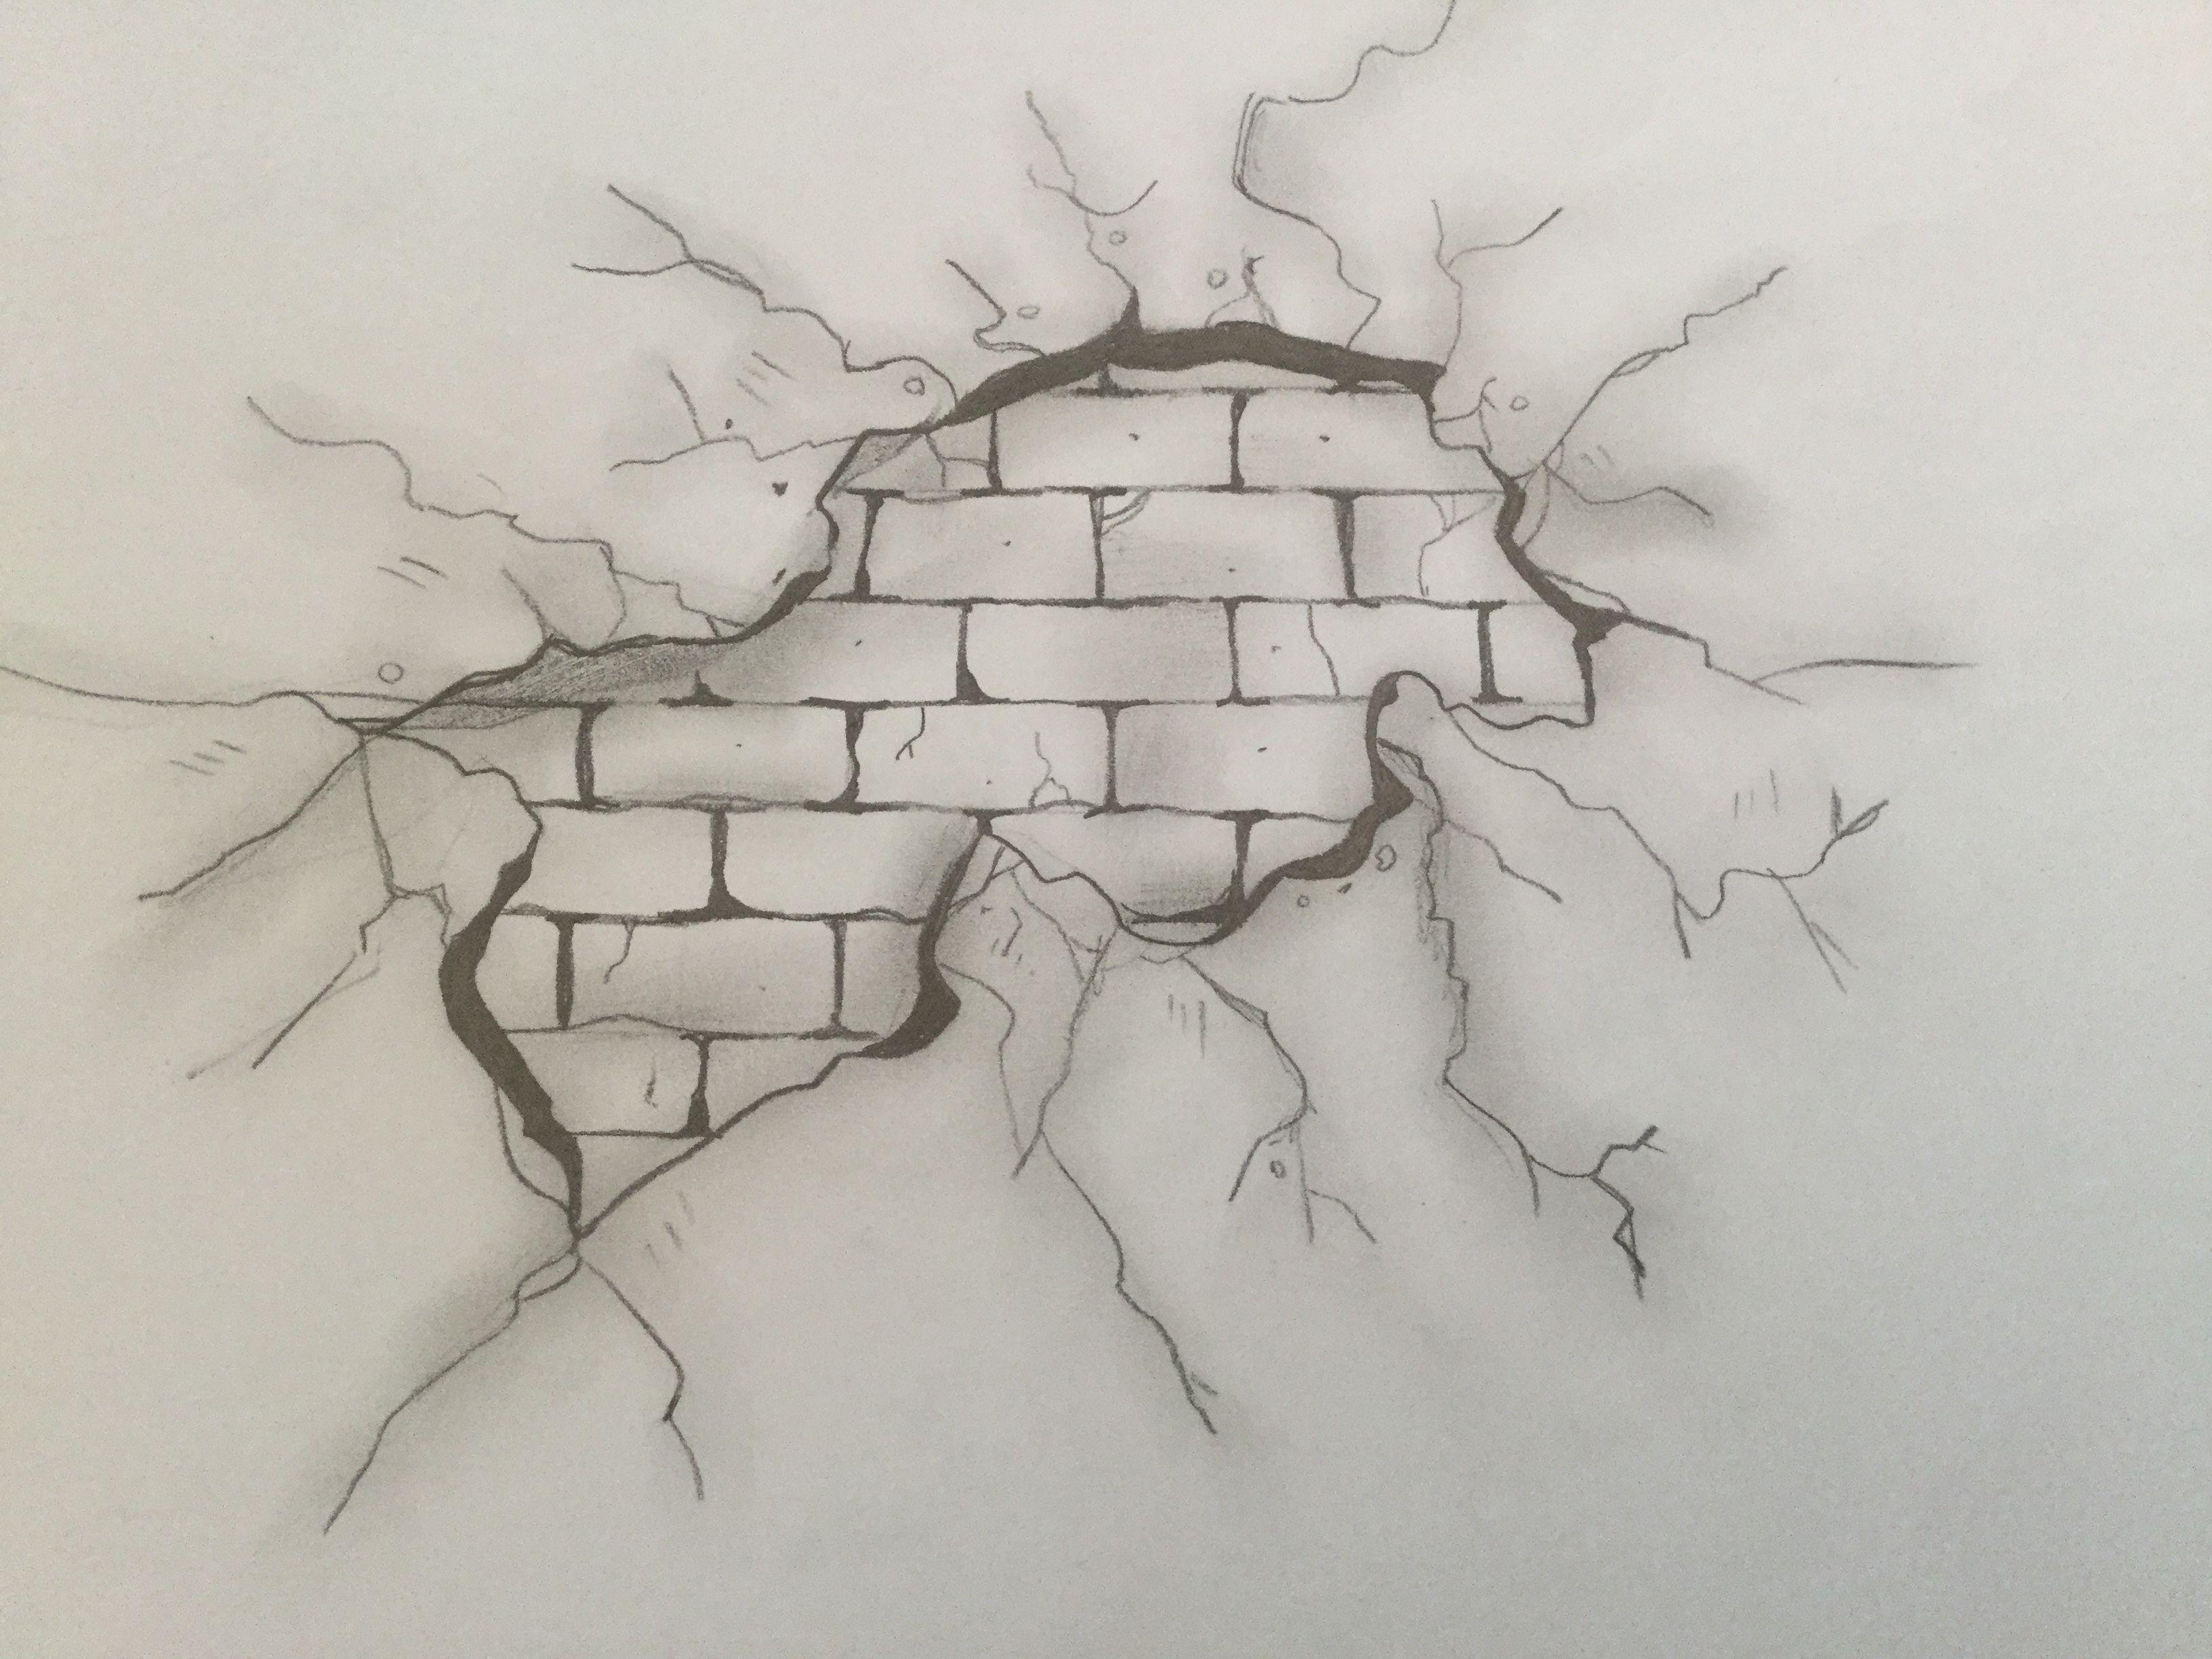 3264x2448 Broken Wall By Claire De Graaff Art Sketch Ideas